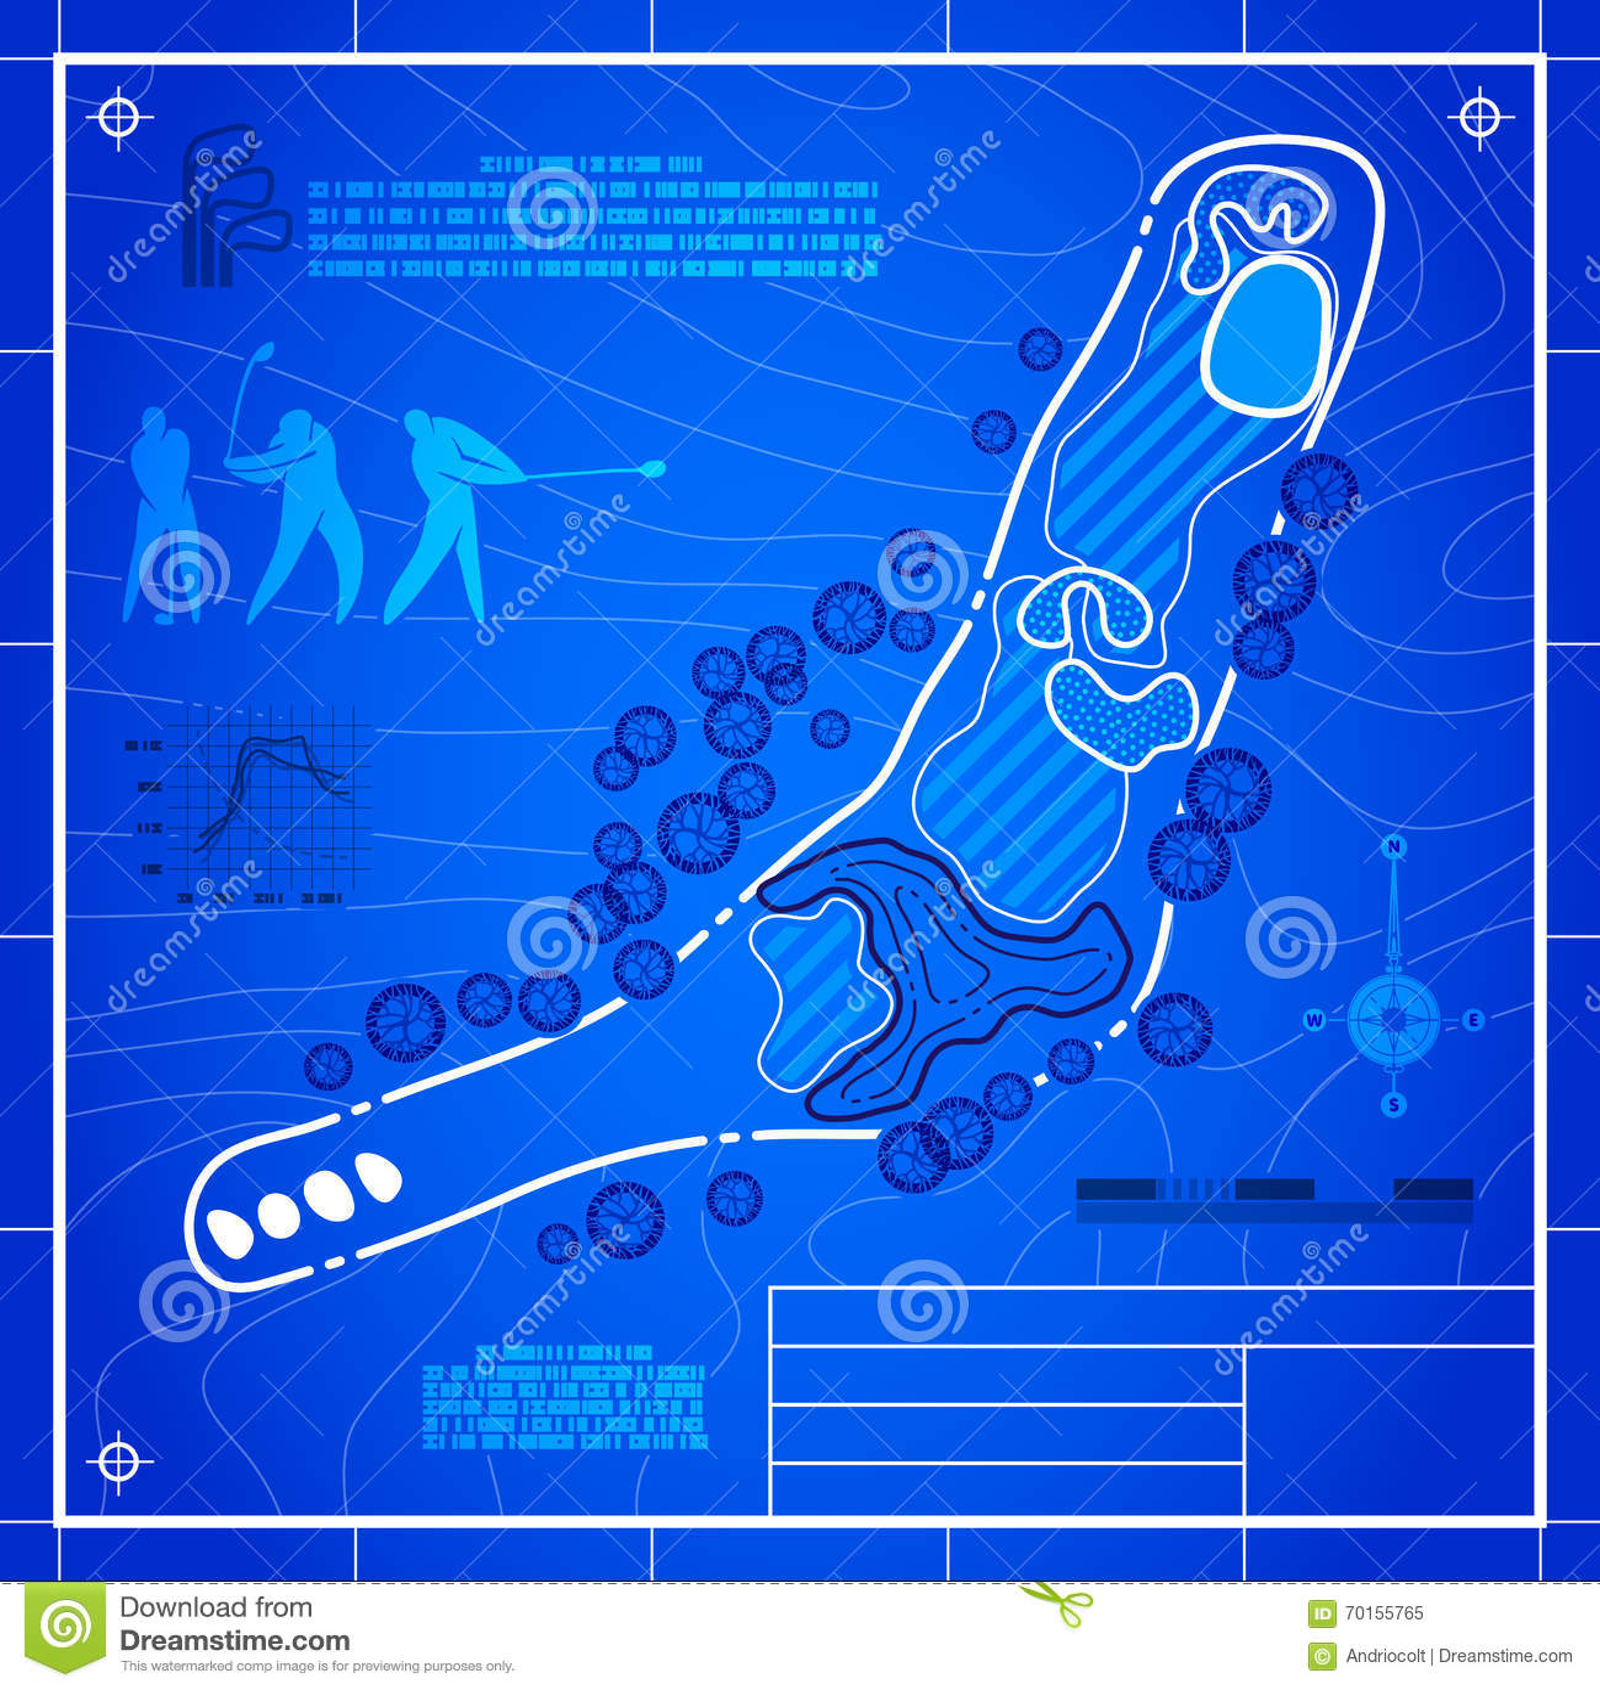 Wonderful blueprint creator online contemporary electrical free blueprint program online dolgular malvernweather Gallery